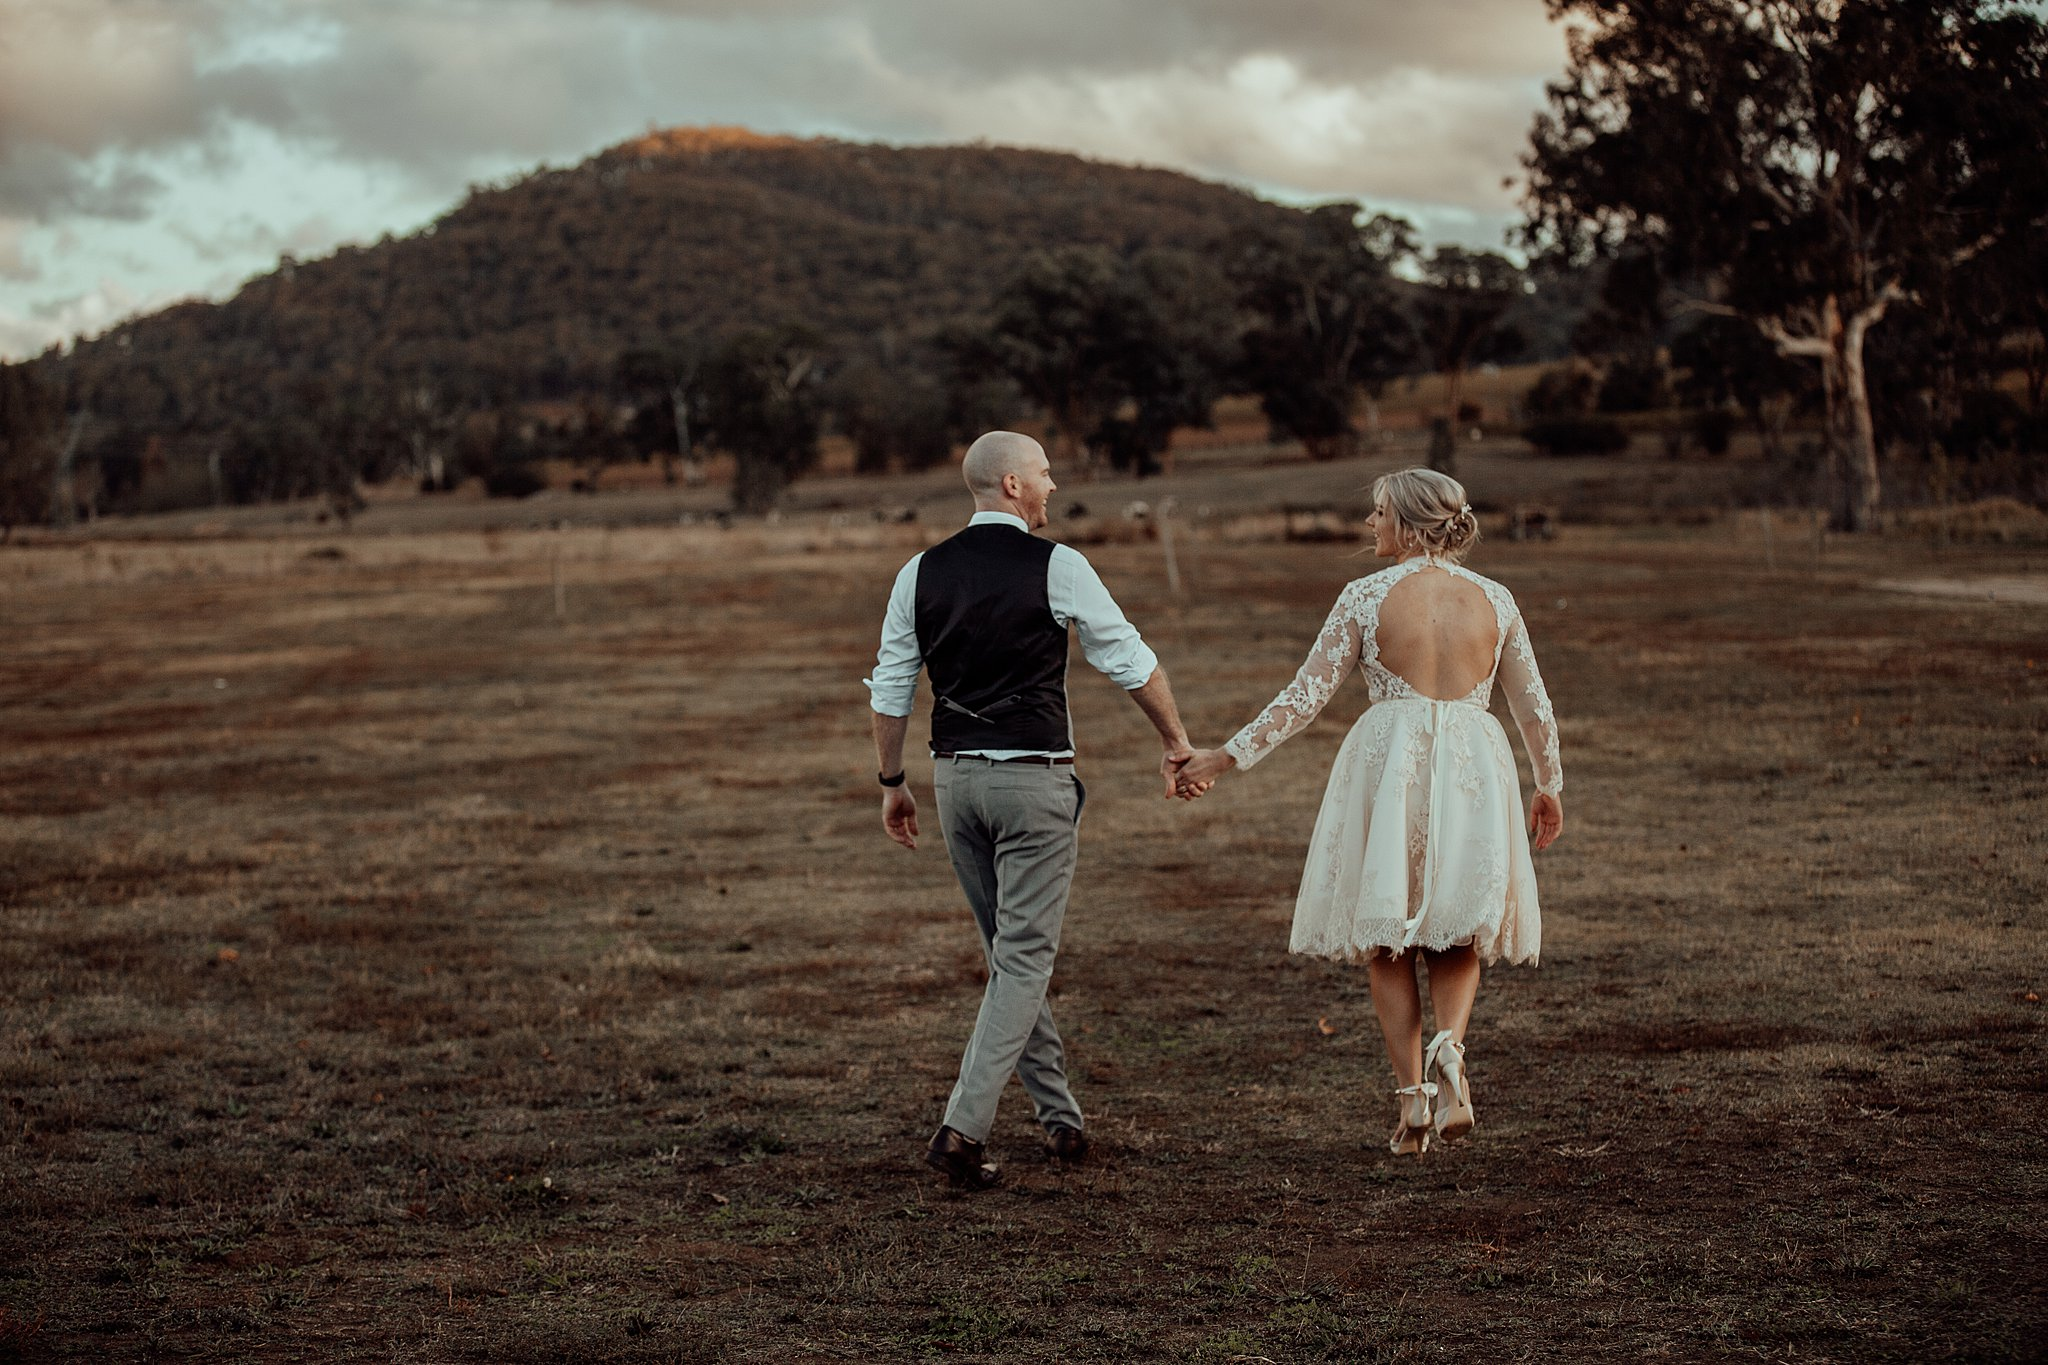 mickalathomas_puremacphotography_weddingphotographer_couplephotographer_Sheppartonphotographer_3475.jpg